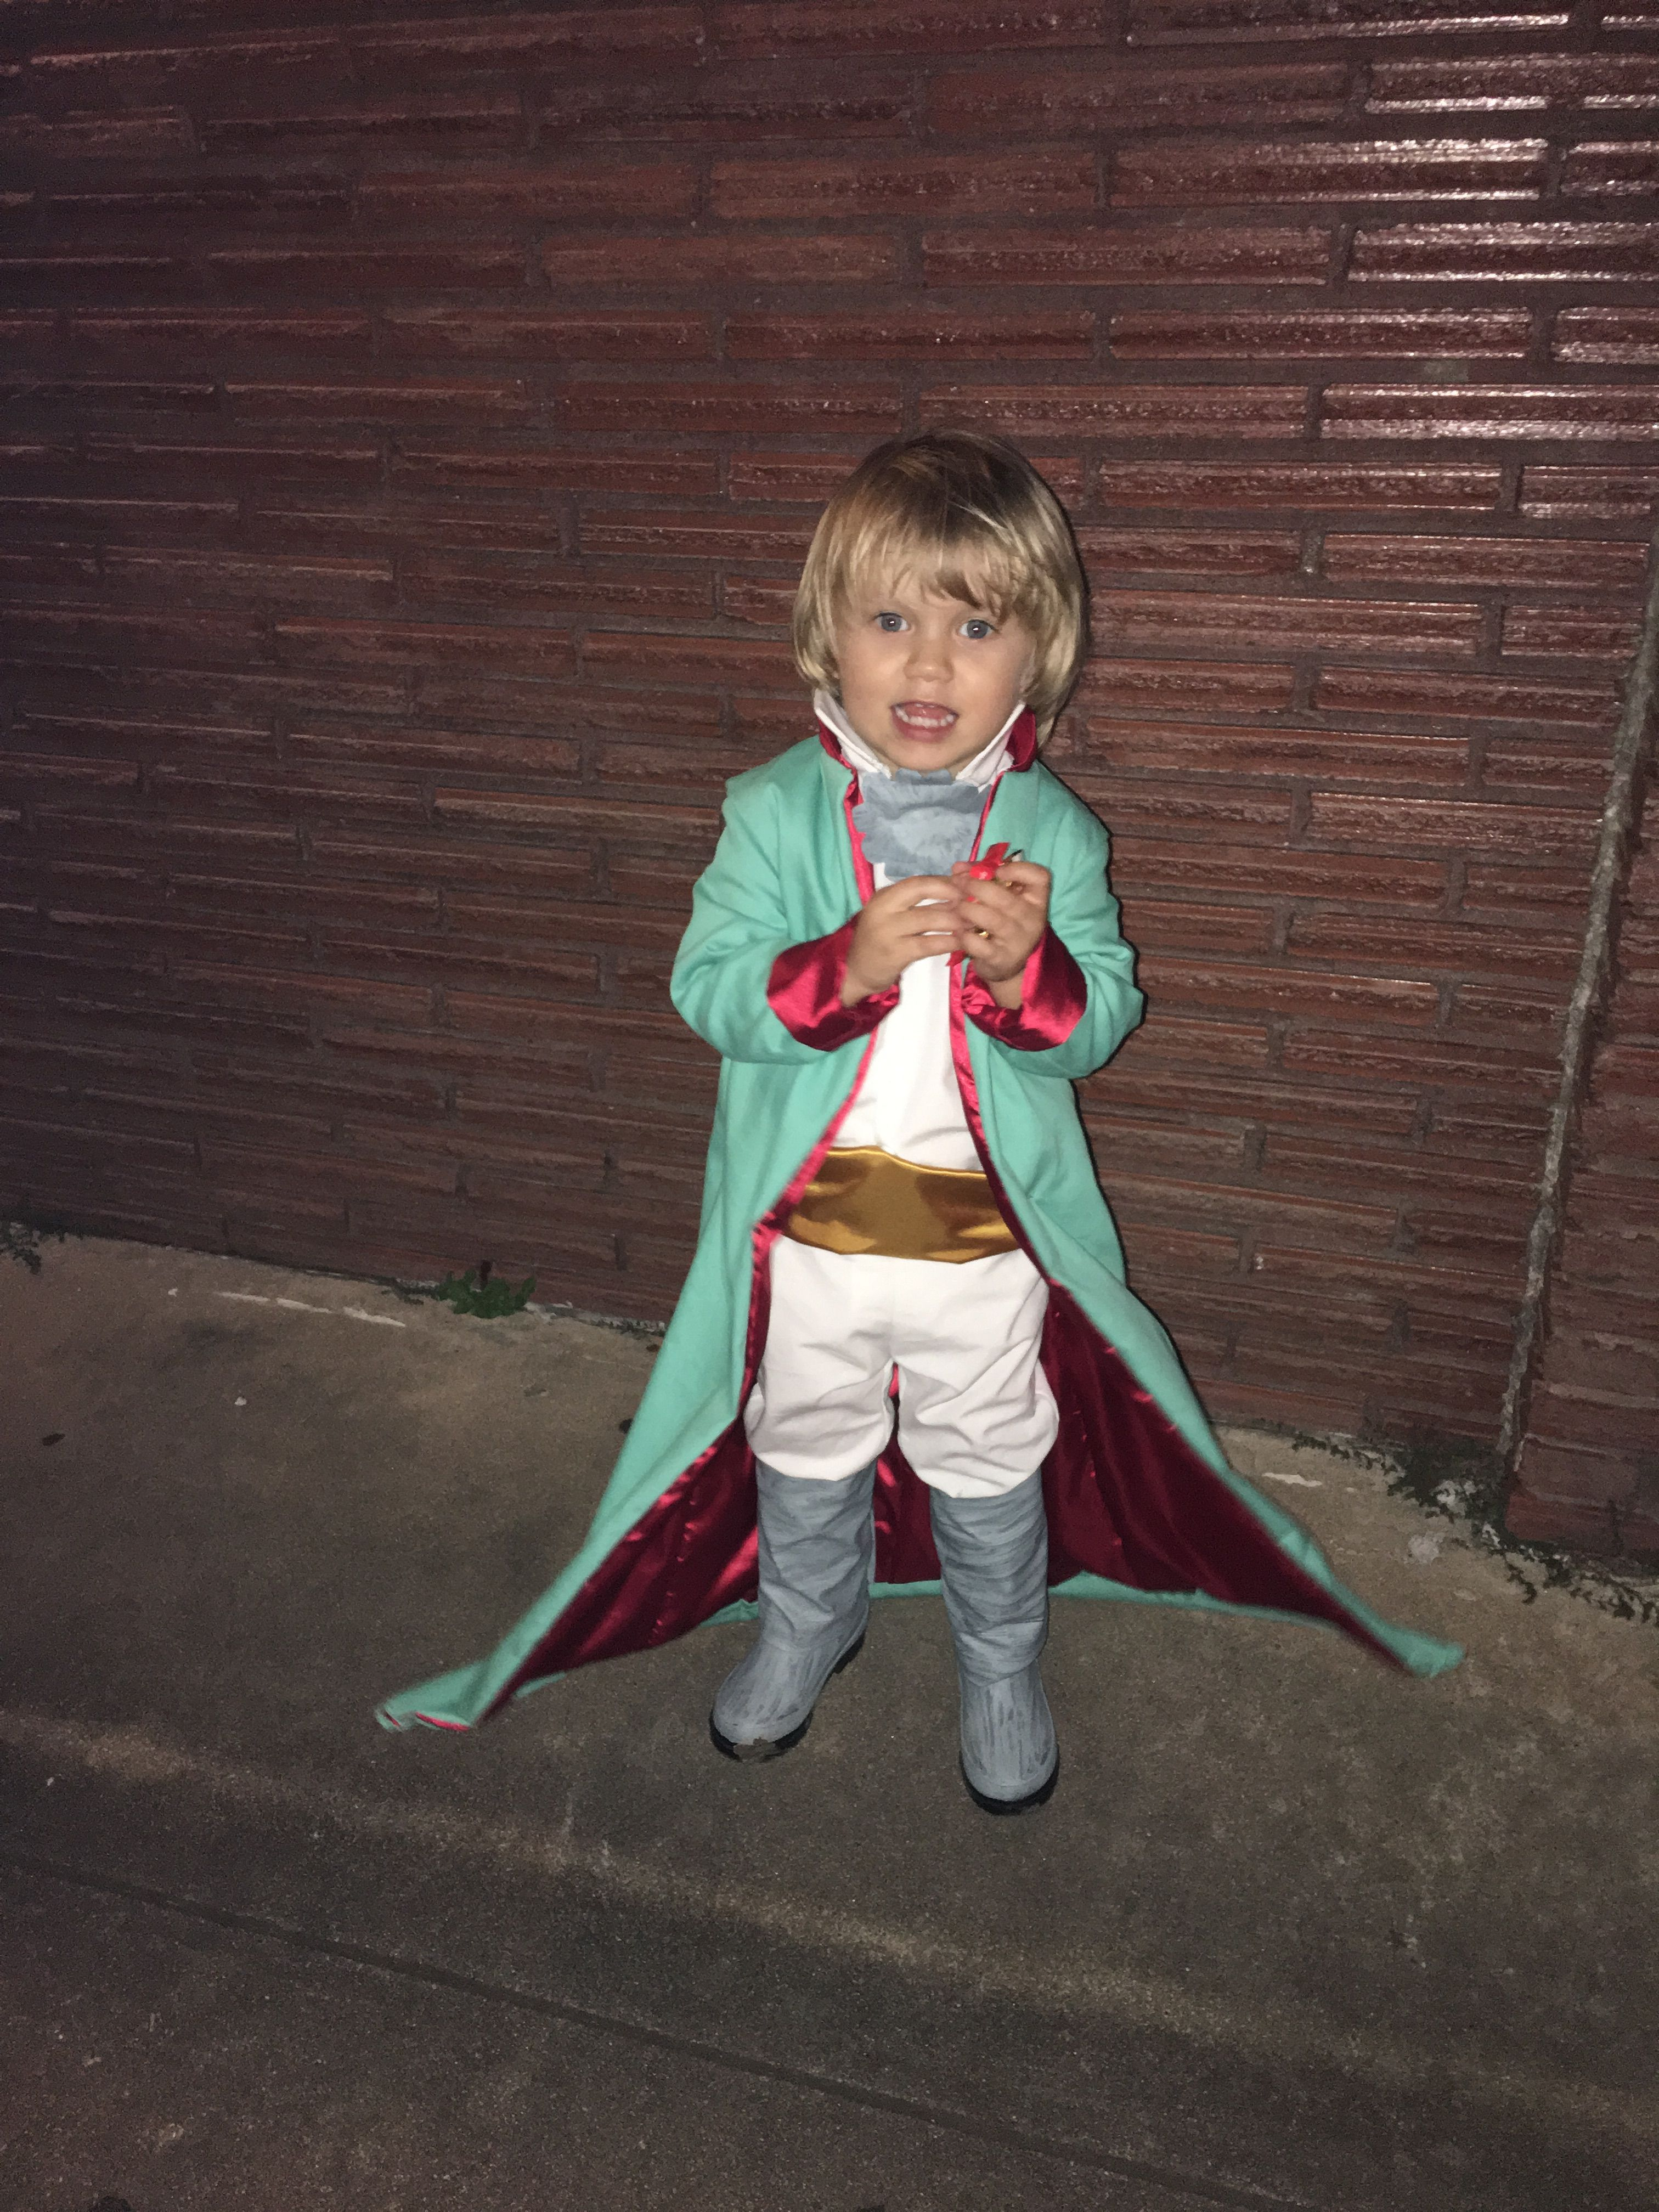 e4c9edeffc42 The Little Prince Costume Le Petit Prince Handmade Toddler Halloween Costume